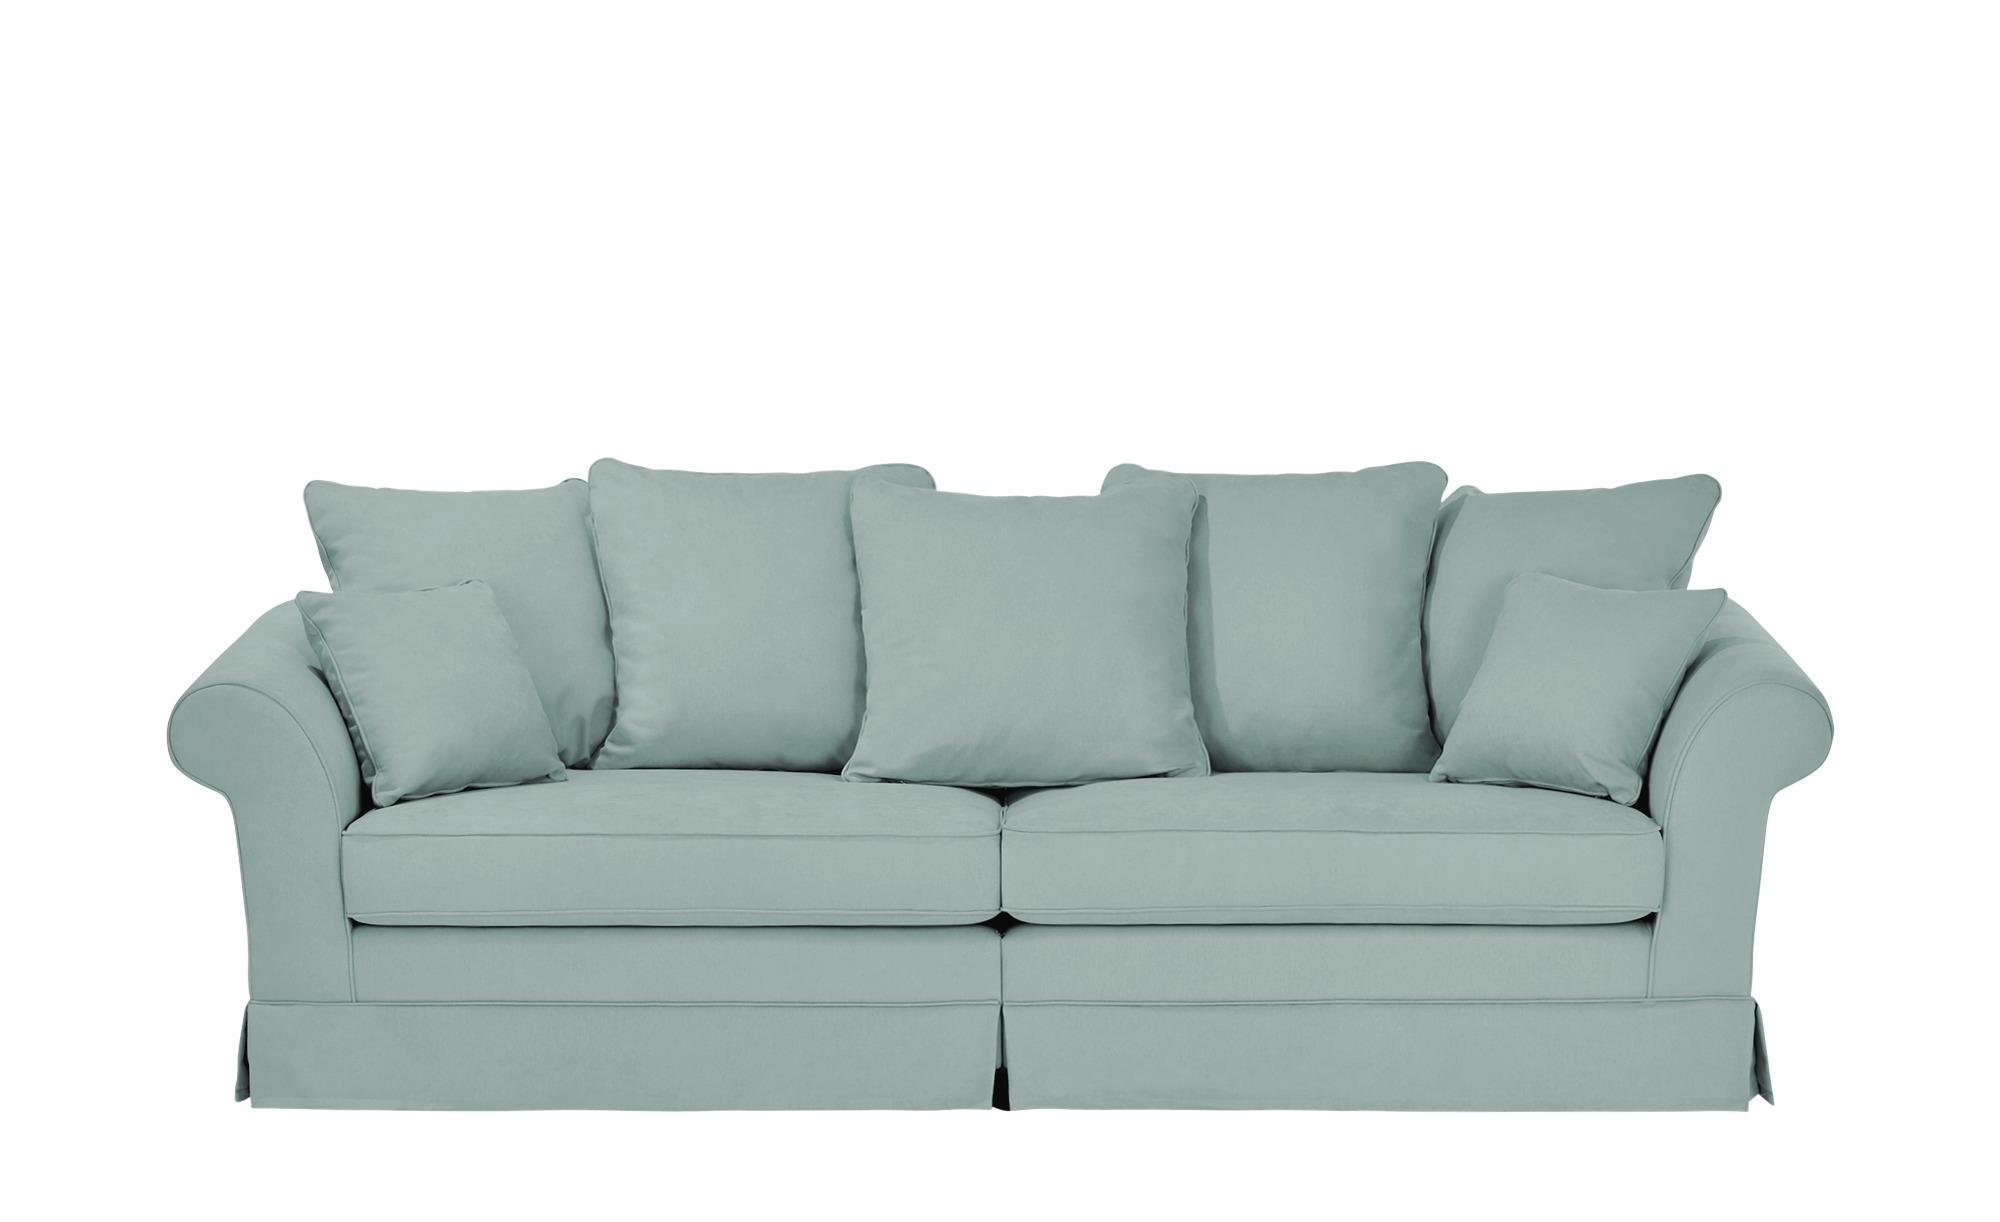 Megasofa Husse  Hampton ¦ blau ¦ Maße (cm): B: 264 H: 70 T: 111 Polstermöbel > Sofas > Einzelsofas - Höffner